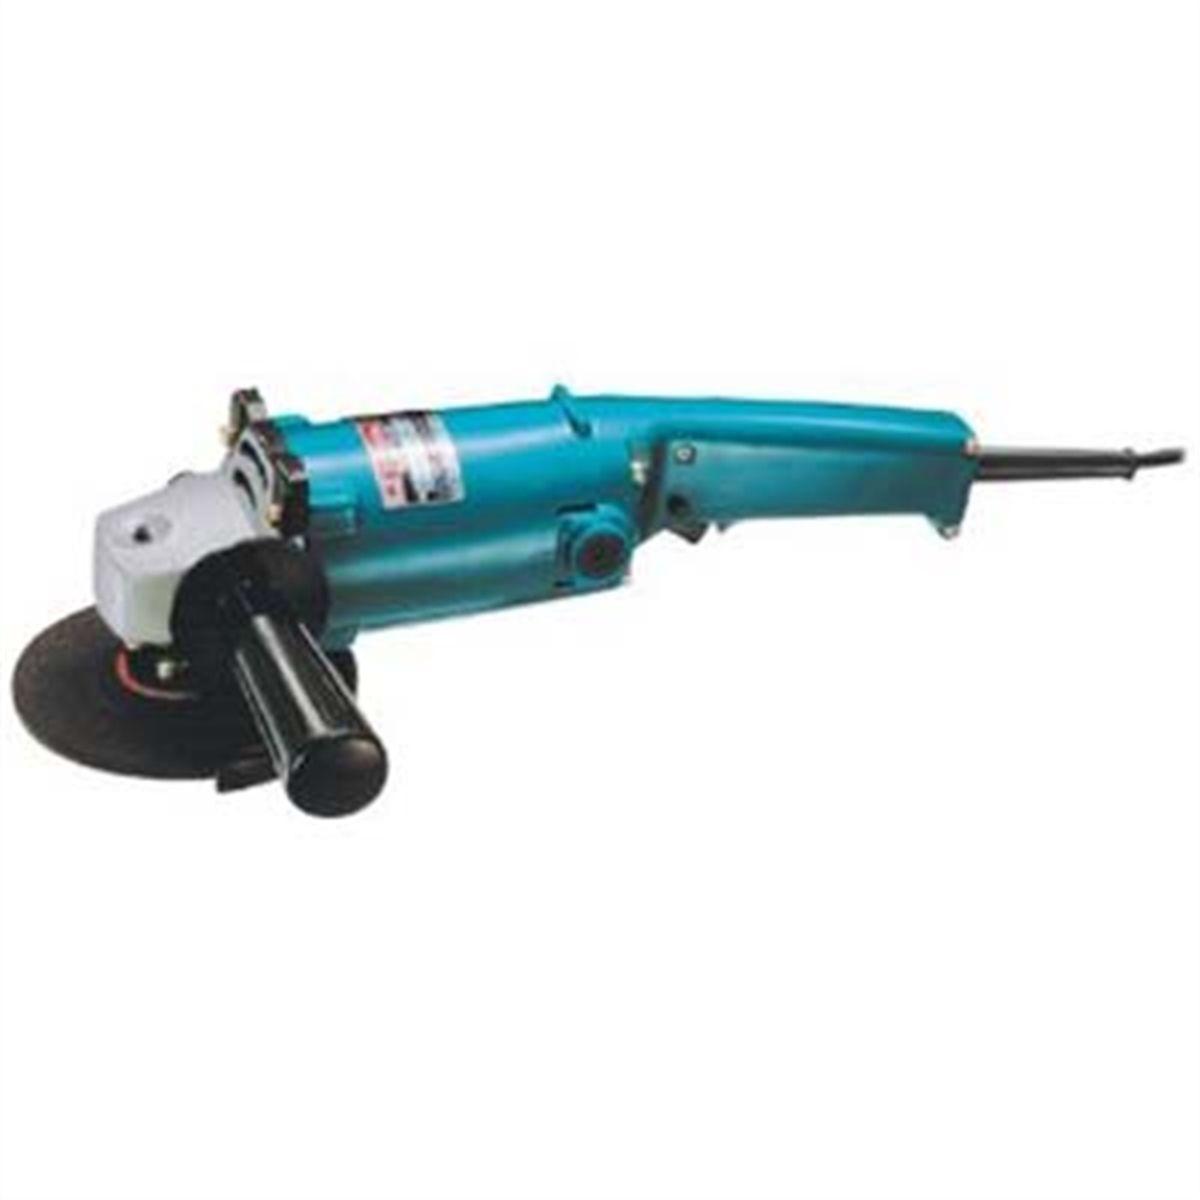 Angle Grinder Uses ~ Angle grinder in